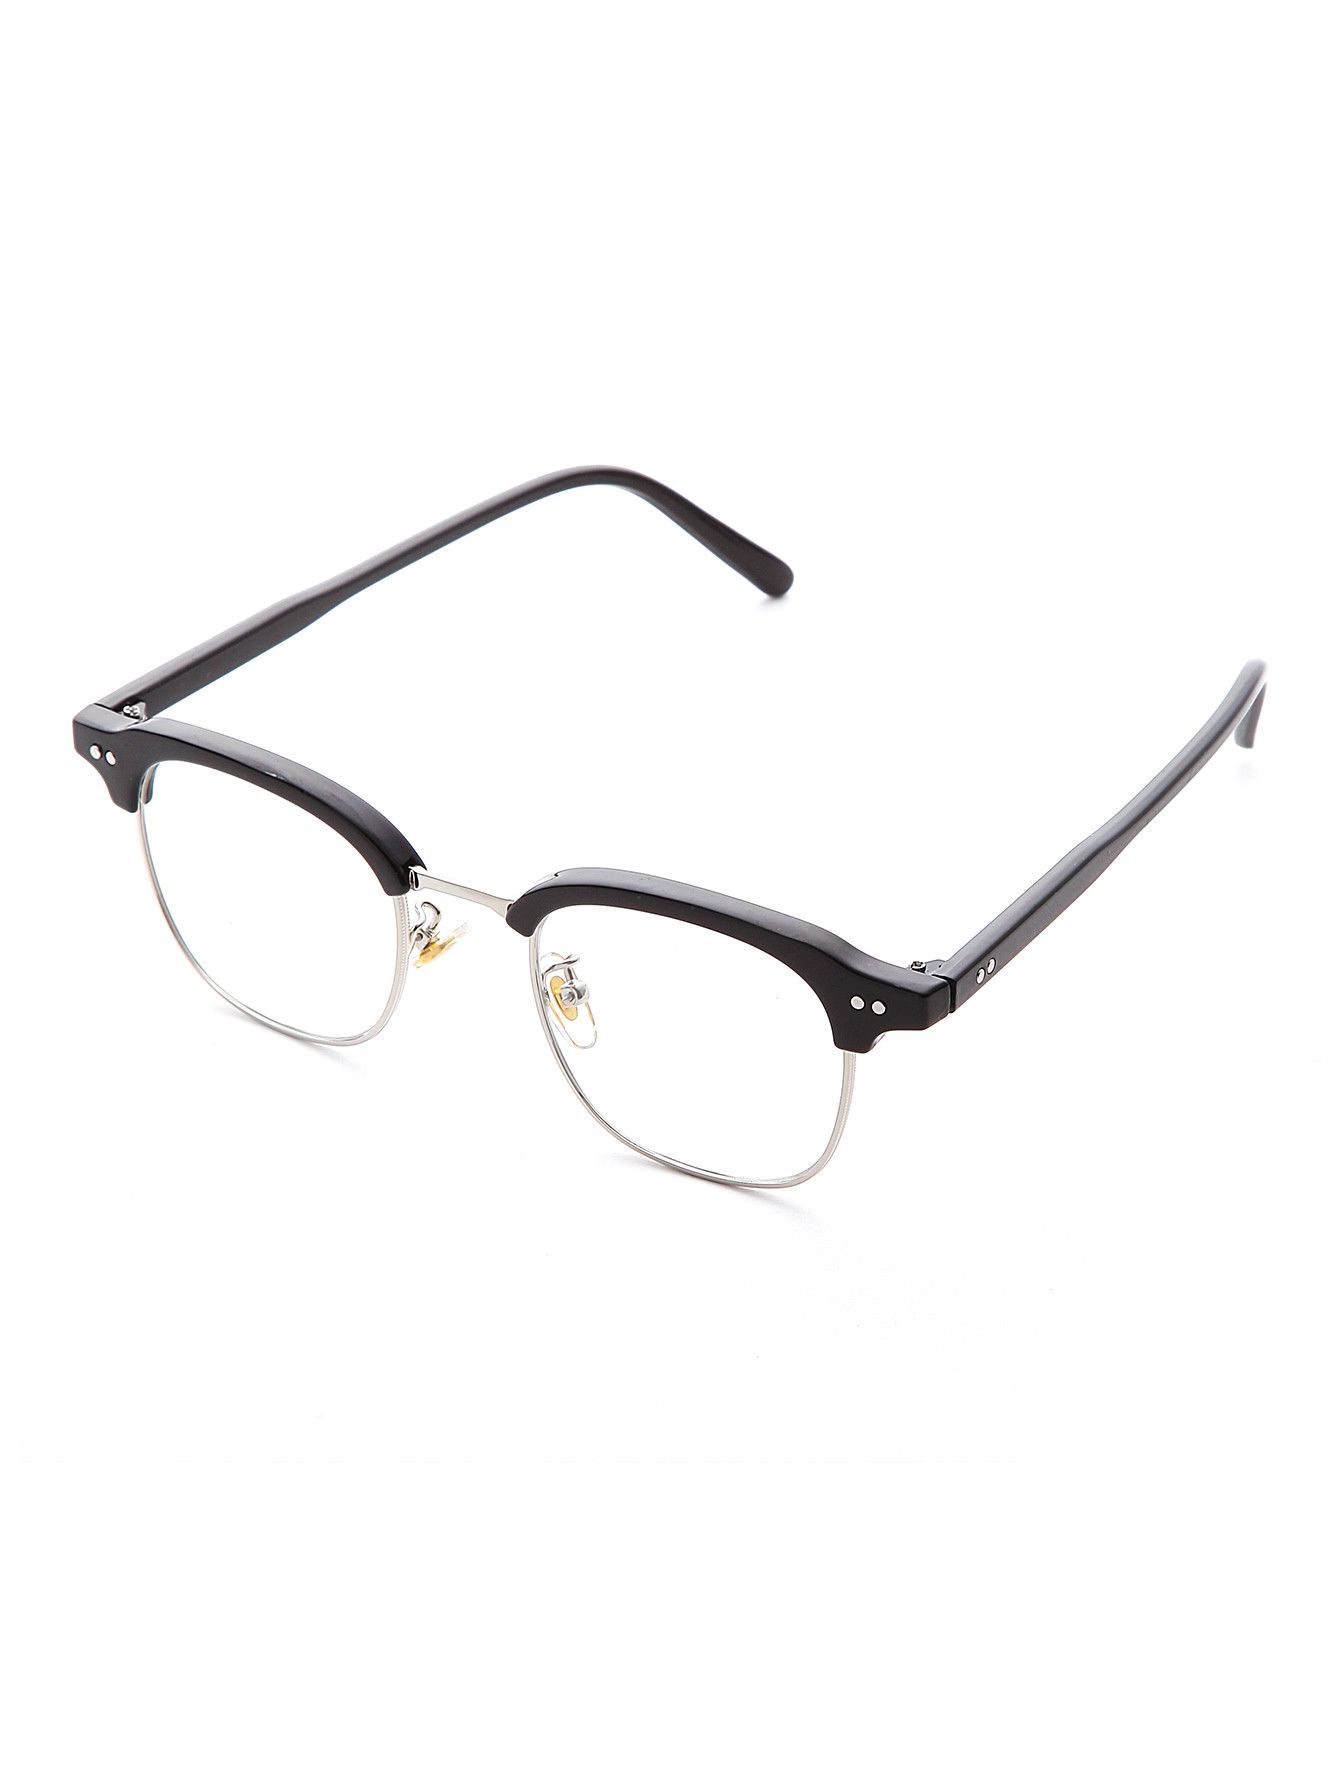 9abe943e7a3b Half Frame Clear Lens Glasses